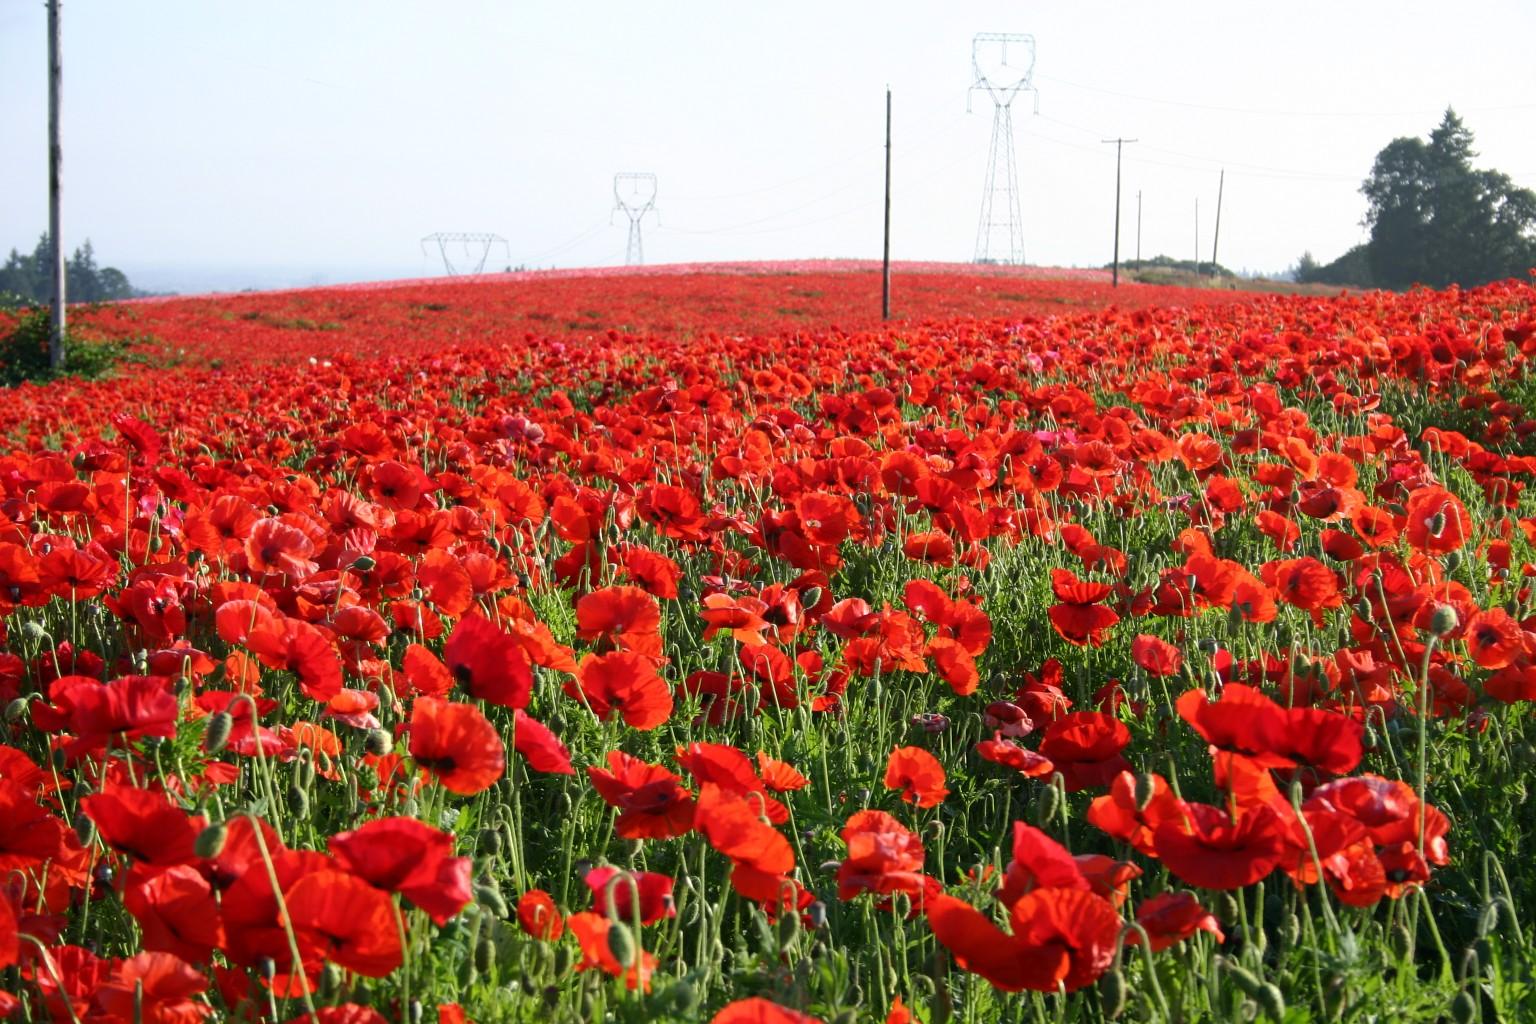 Silver falls seed company red poppy american legion red poppy mightylinksfo